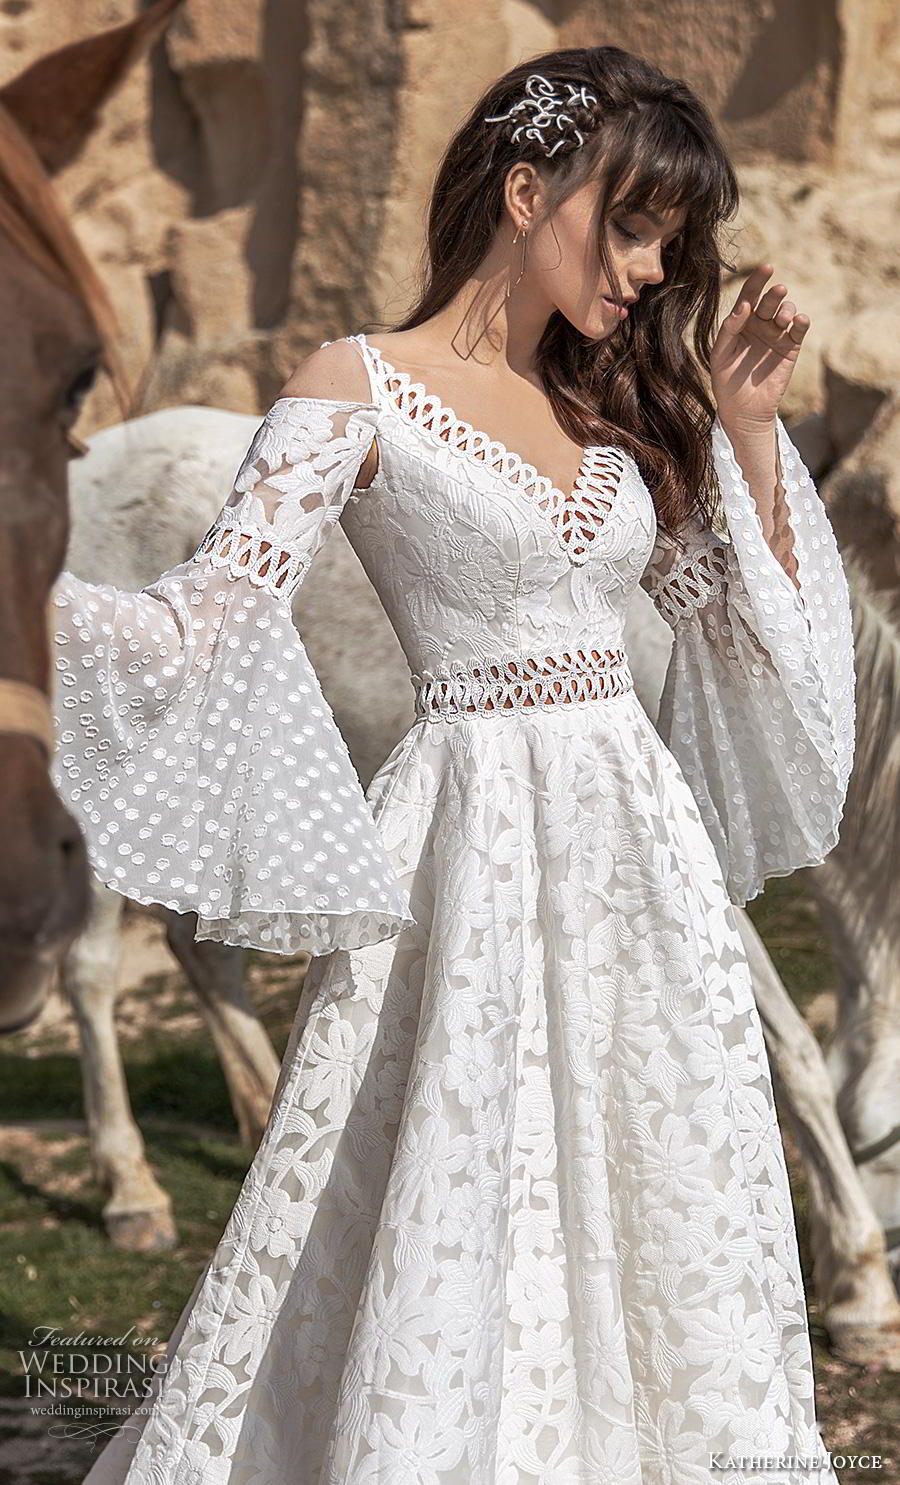 katherine joyce 2020 bridal cold shoulder long funnel sleeves v neck full embellishment romantic bohemian a  line wedding dress open v back chapel train (1) zv